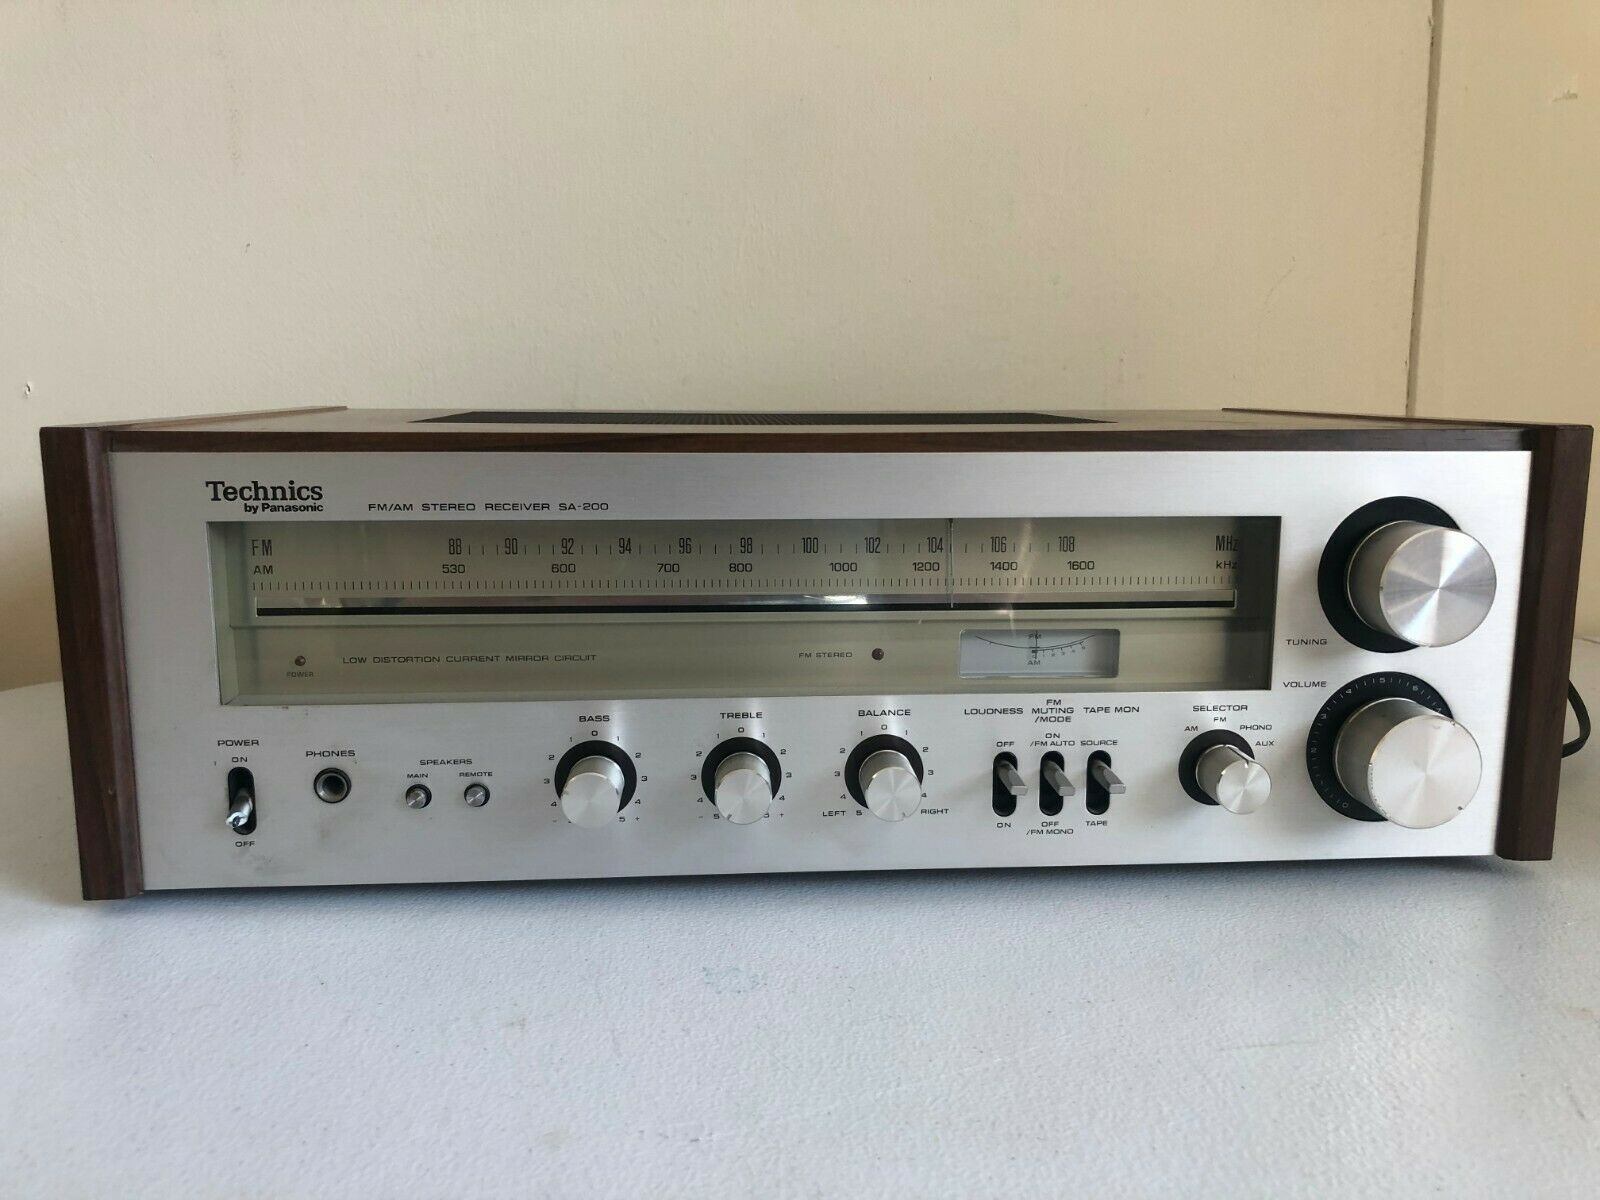 Technics SA-200 AM/FM Stereo Receiver Vintage Retro Audiophile Wood Grain